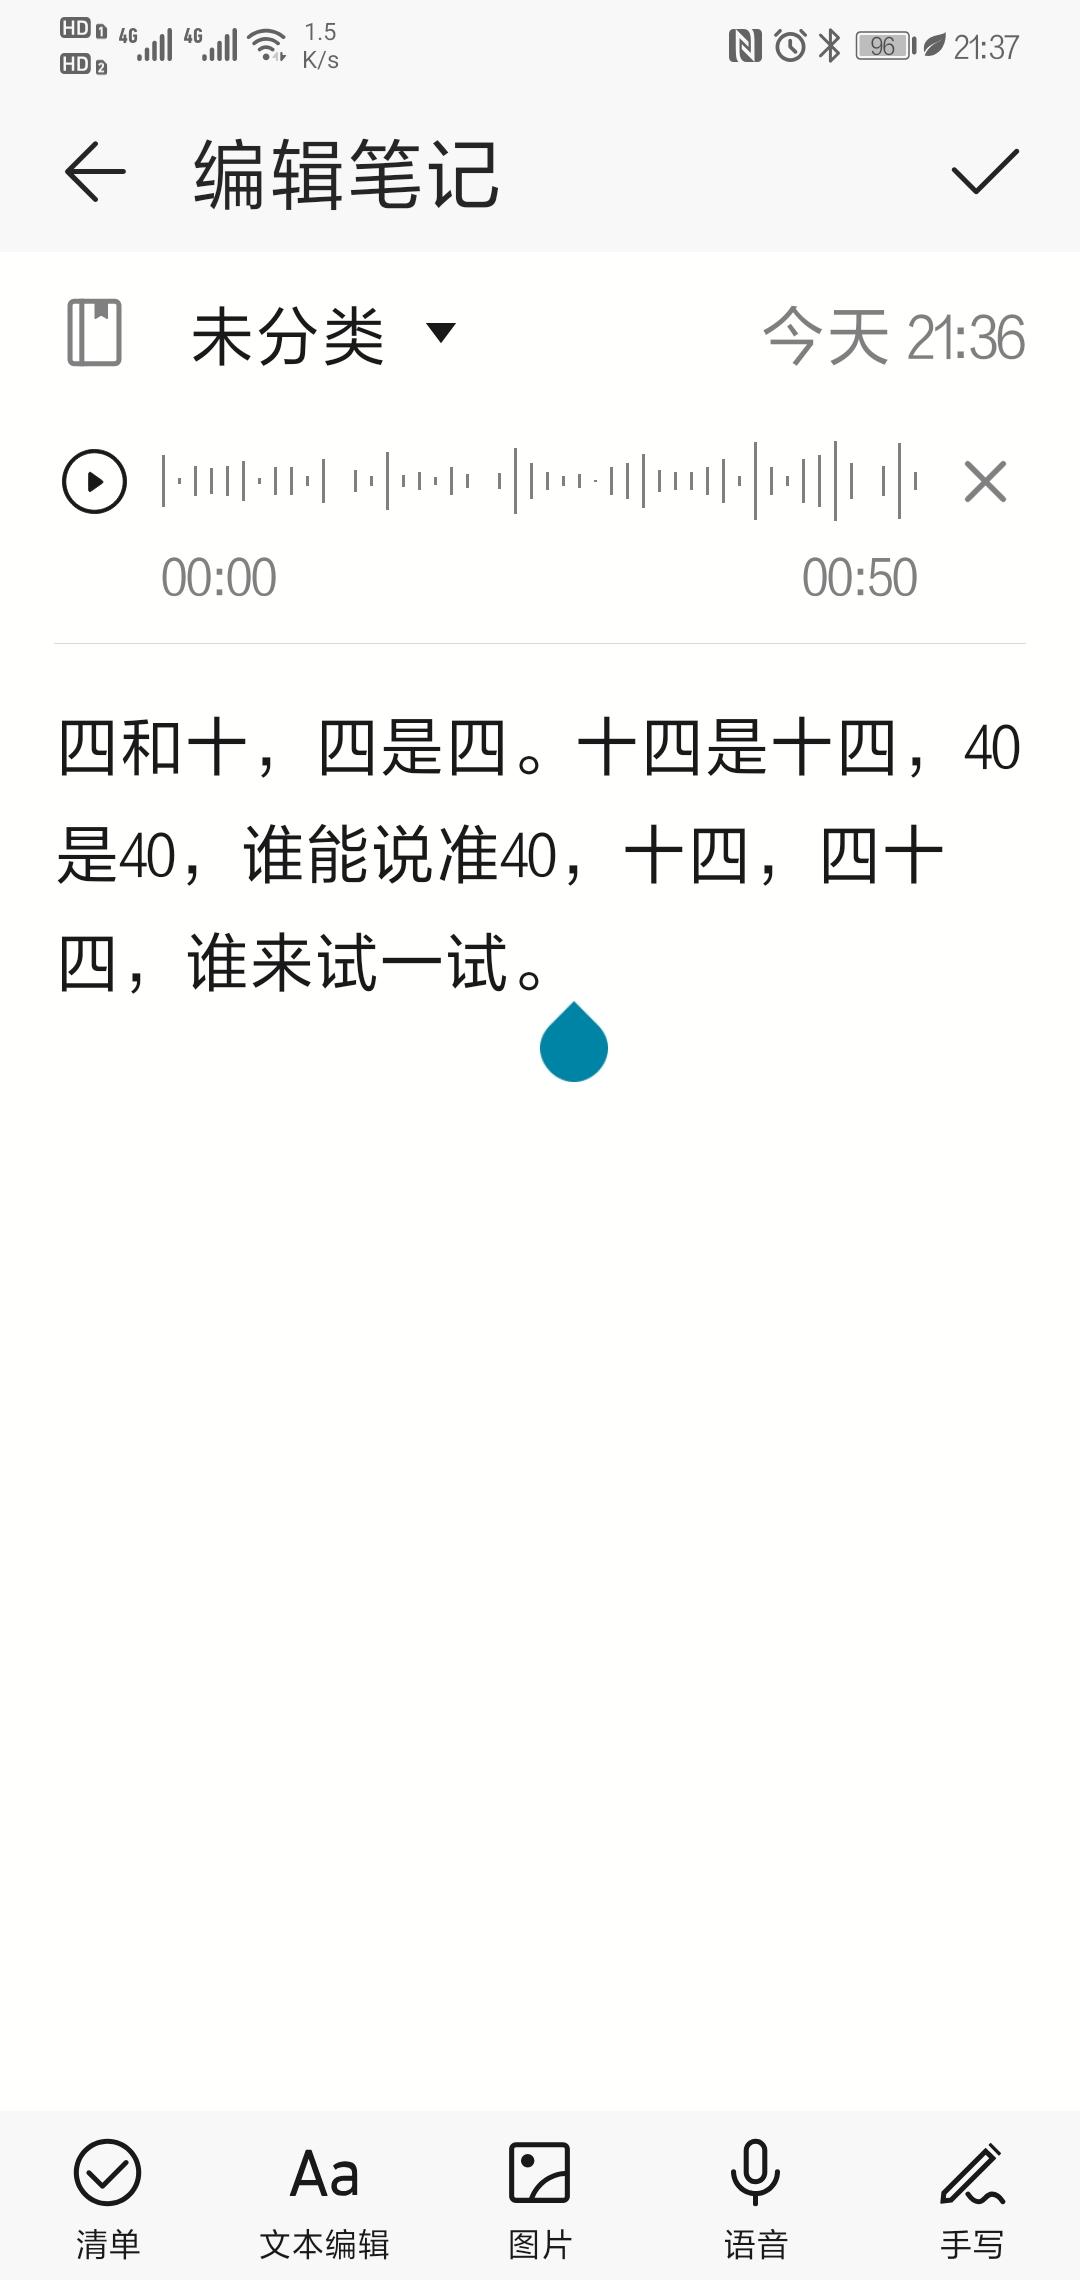 Screenshot_20190820_213713_com.example.android.notepad.jpg